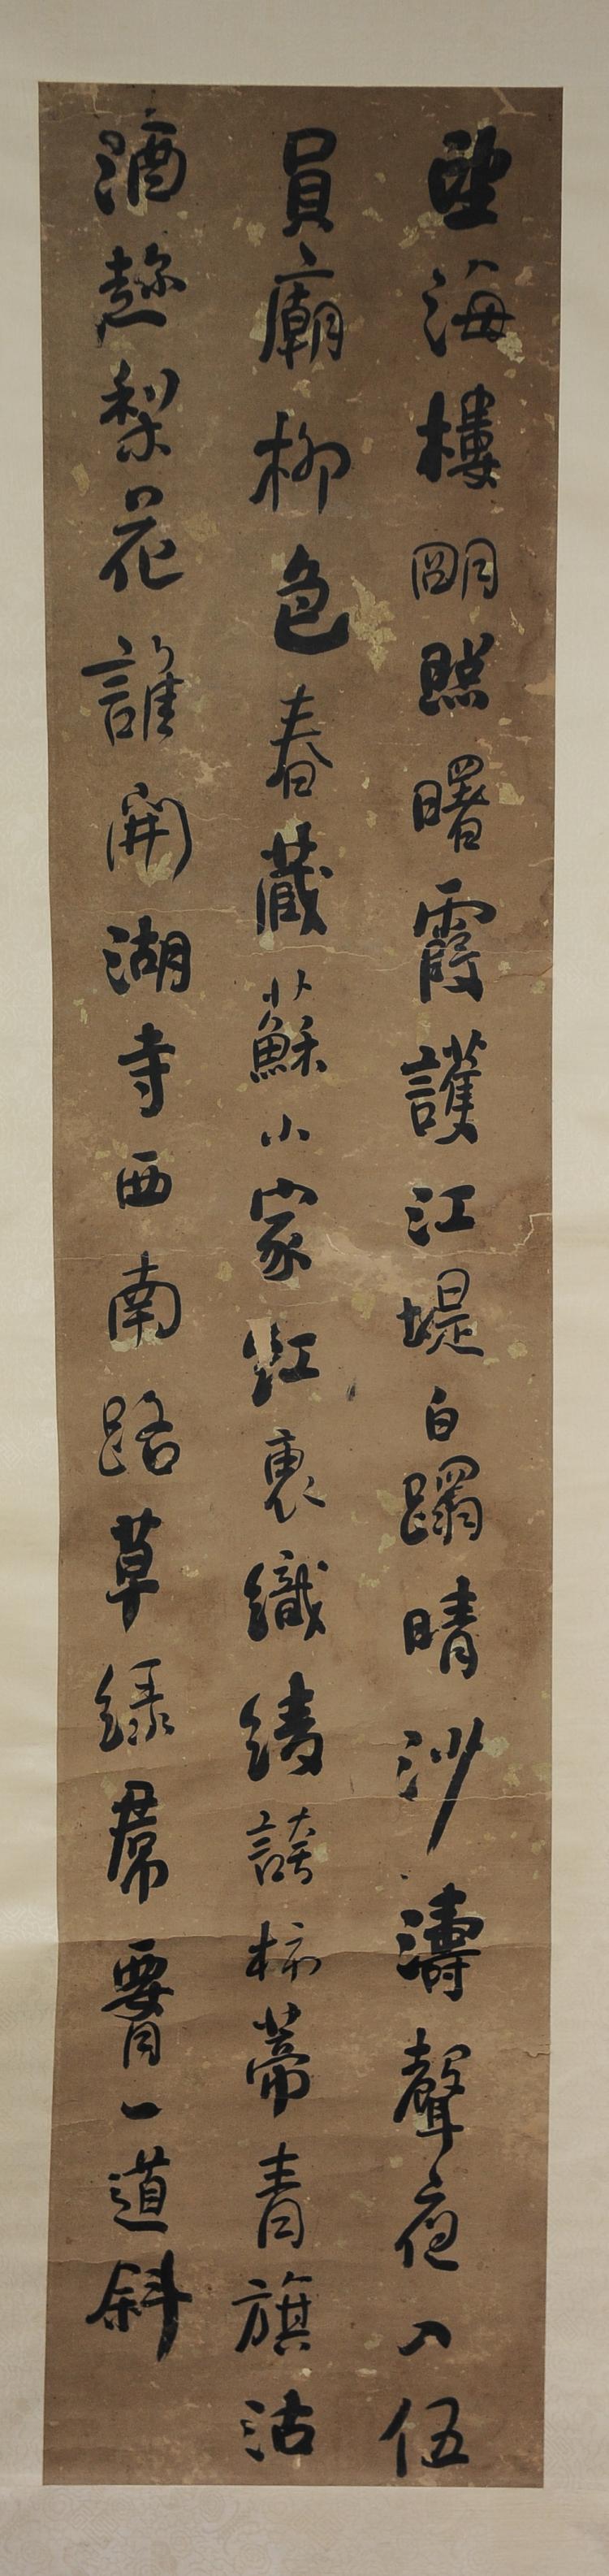 A Calligraphy by Yi Qiao